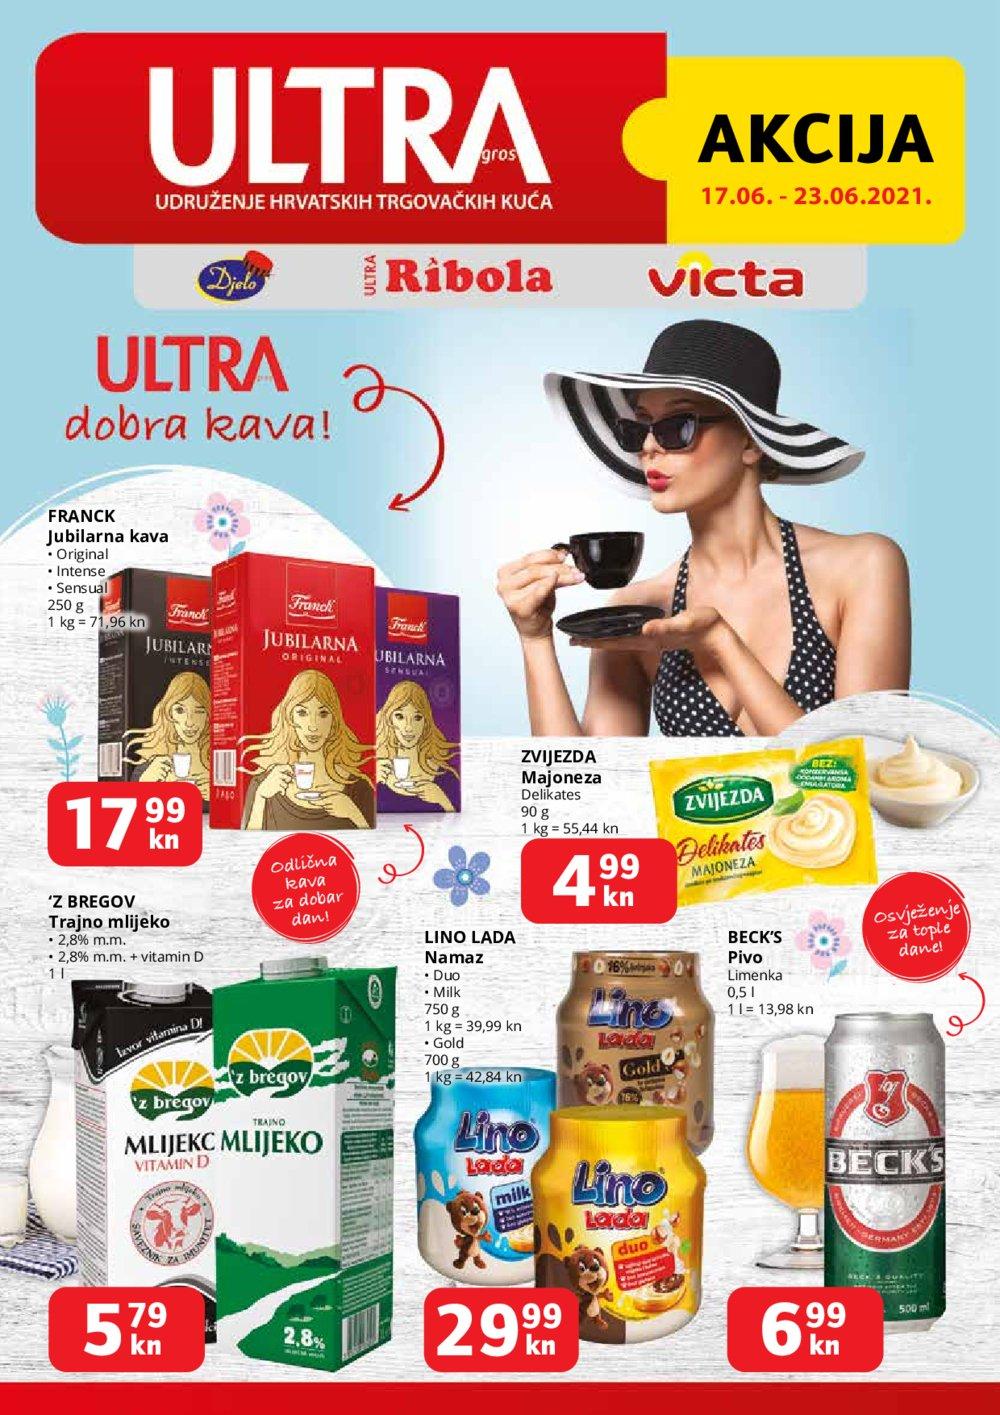 Ribola katalog Ultra Gros Akcija 17.06.-23.06.2021.